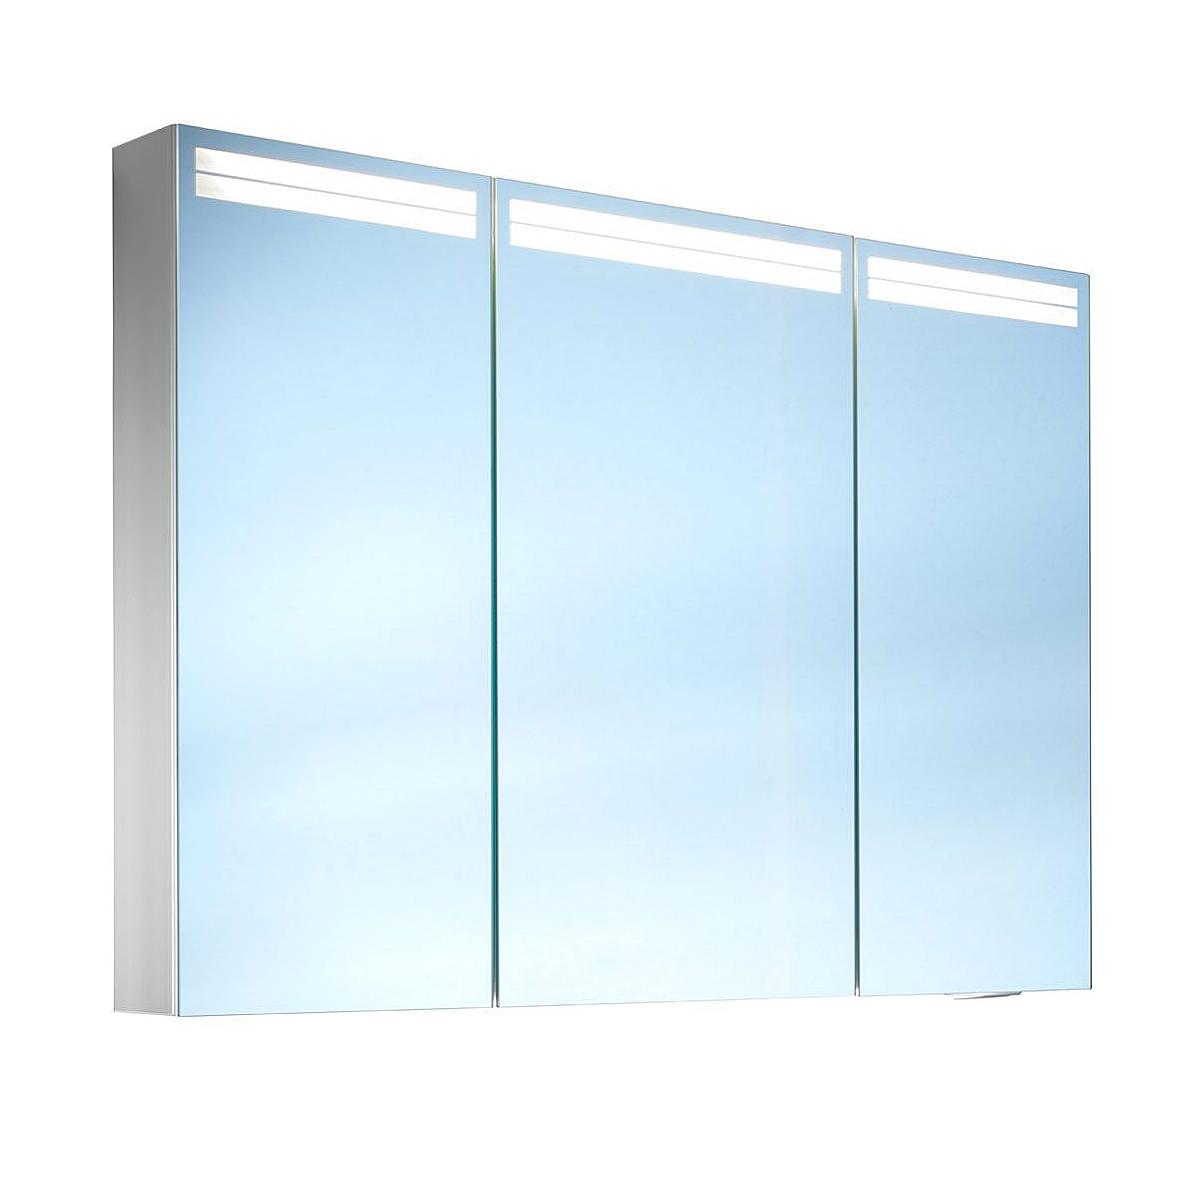 Schneider Arangaline 3 Door Mirror Cabinet 1000mm